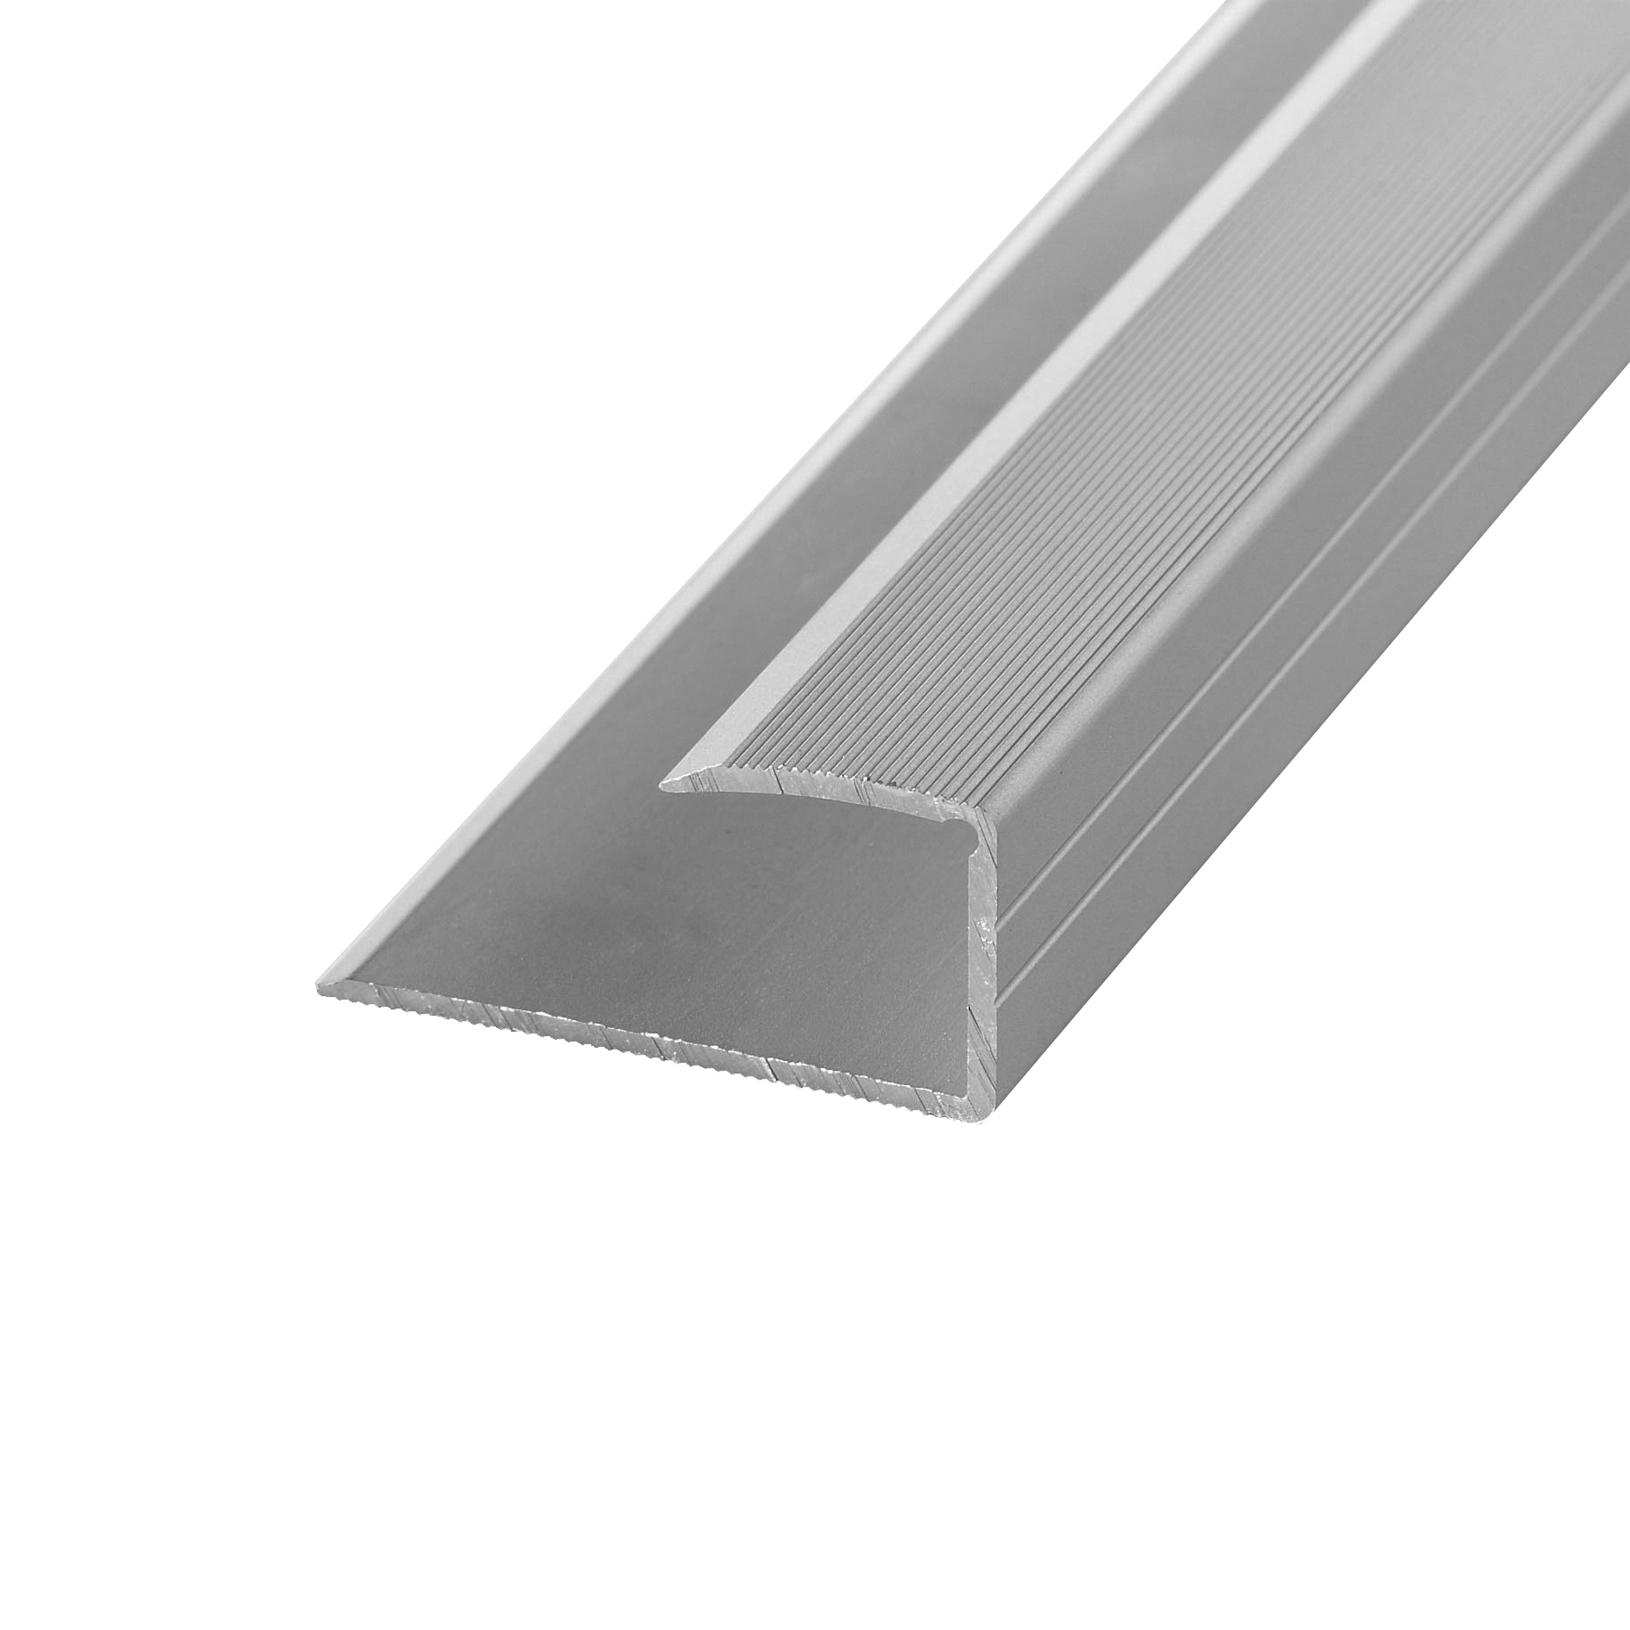 Edging profile 12-14mm alu stainl. steel